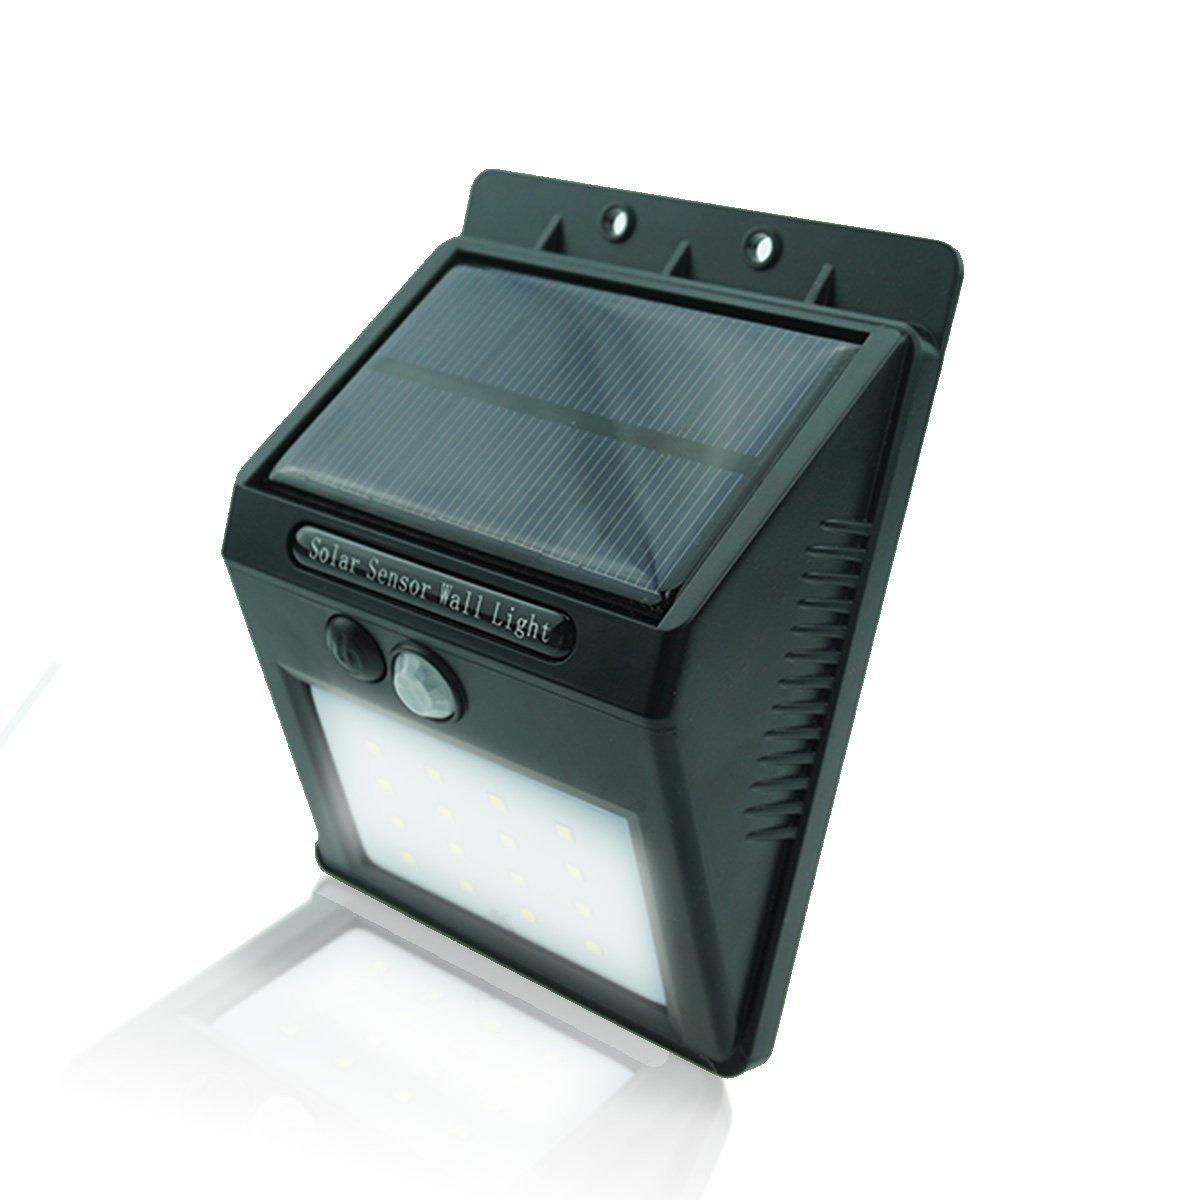 Bon Venu Solar Powered Outdoor Lights Motion Sensor Lamp Wireless Wall Lights 16 LEDs Weatherproof Auto ON/OFF Step Lights for Home Patio Garden Yard Driveway Porch